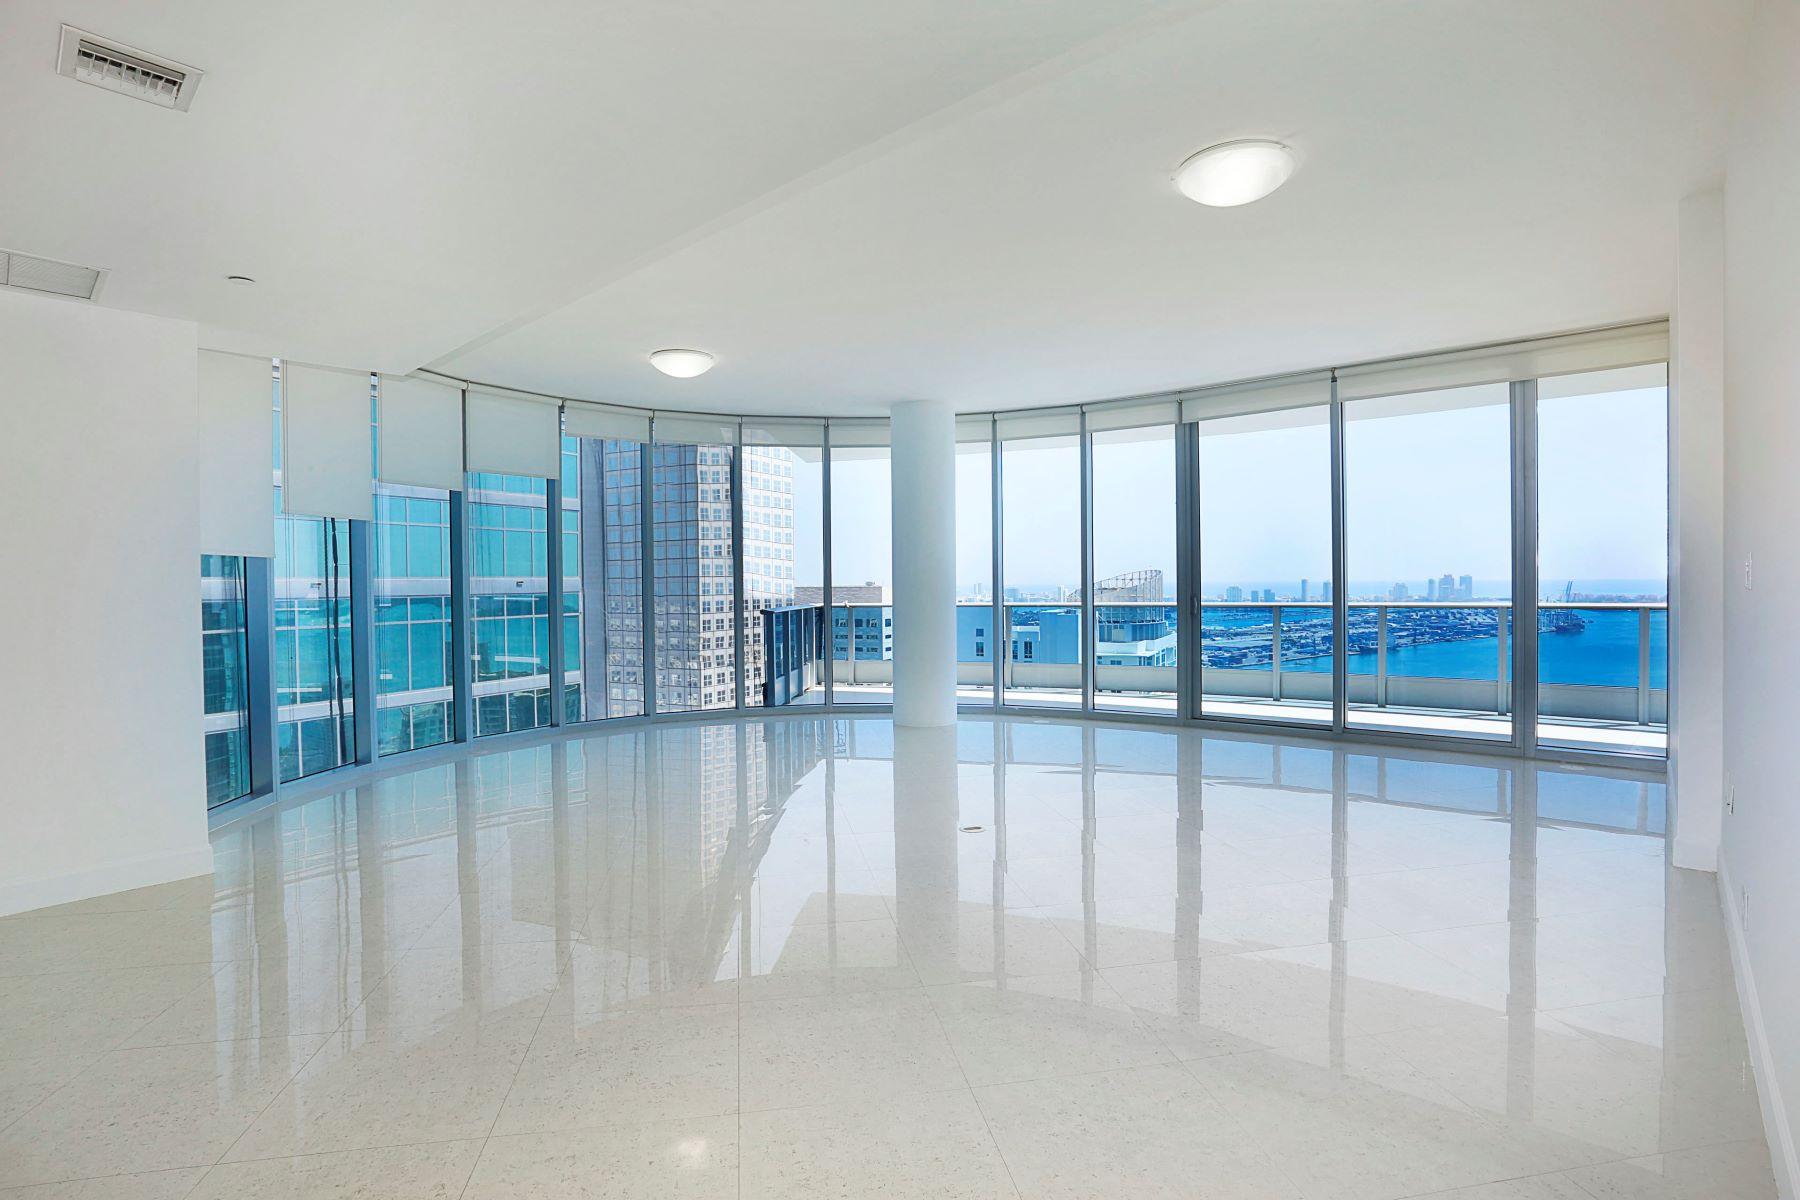 Condominium for Sale at 200 Biscayne Boulevard W #4901 200 Biscayne Boulevard W 4901 Miami, Florida, 33131 United States